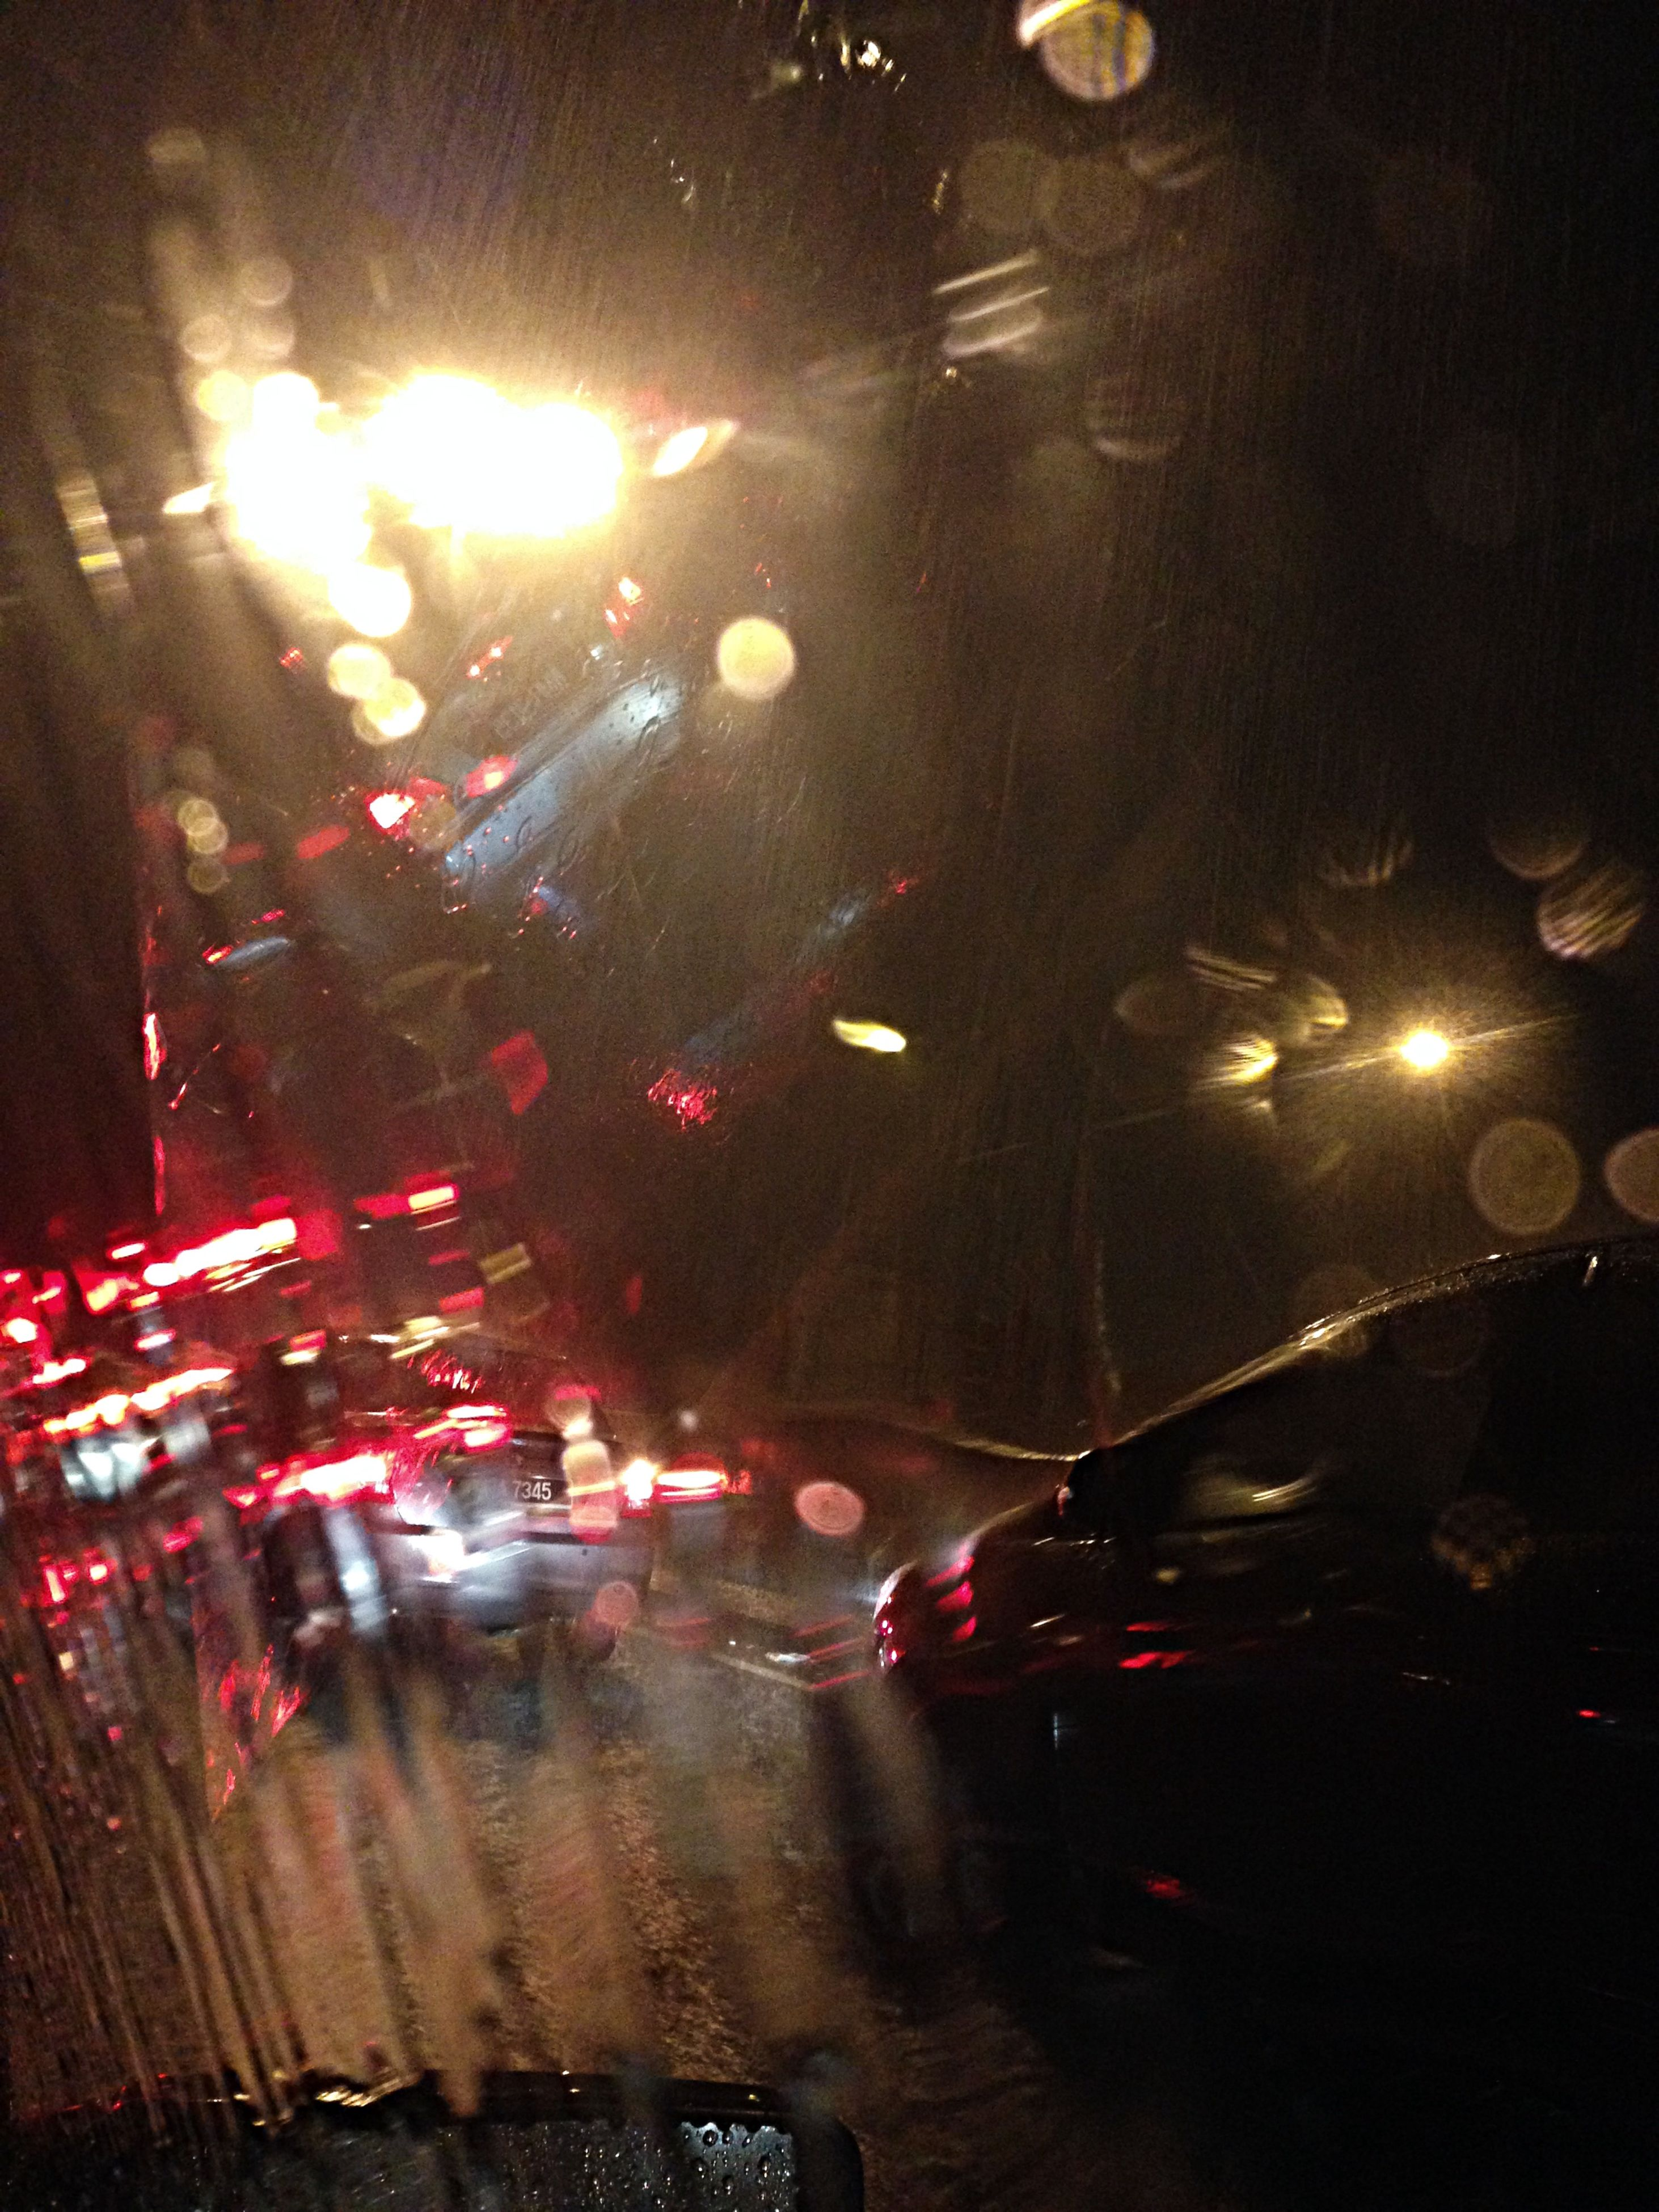 car, transportation, illuminated, land vehicle, night, mode of transport, street, road, traffic, street light, wet, city street, city, rain, on the move, headlight, tail light, city life, lighting equipment, motion